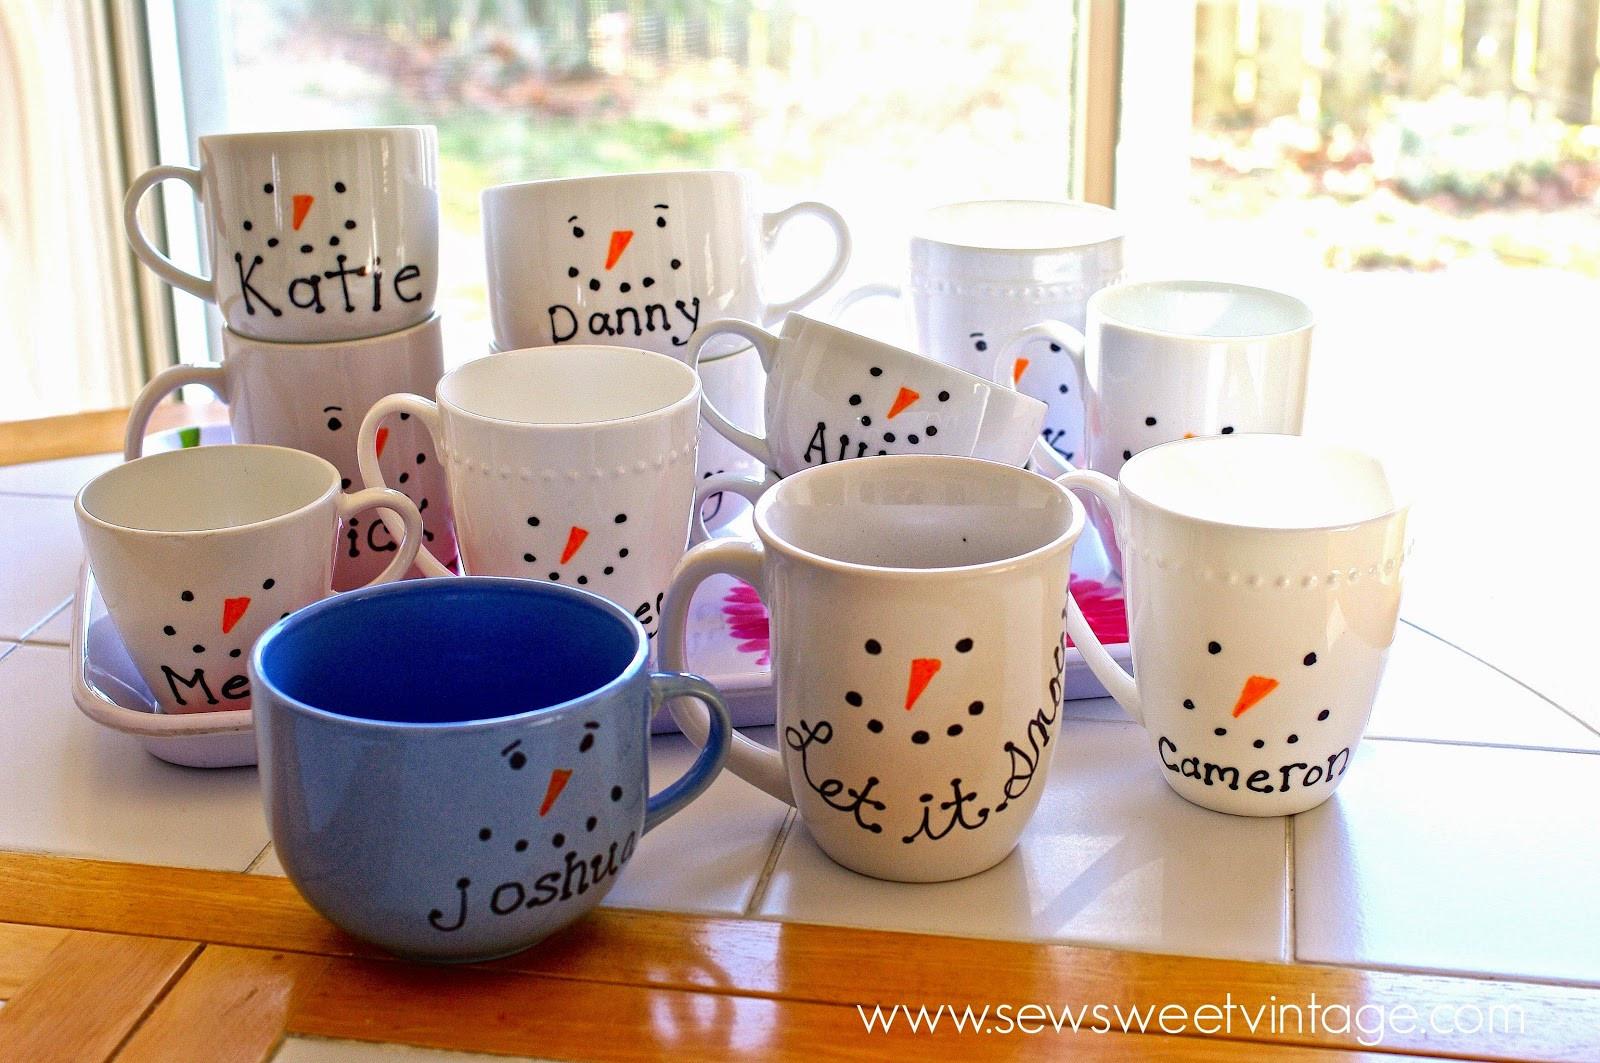 Best ideas about DIY Christmas Mug . Save or Pin Sew Sweet Vintage sharpie snowman mug Now.